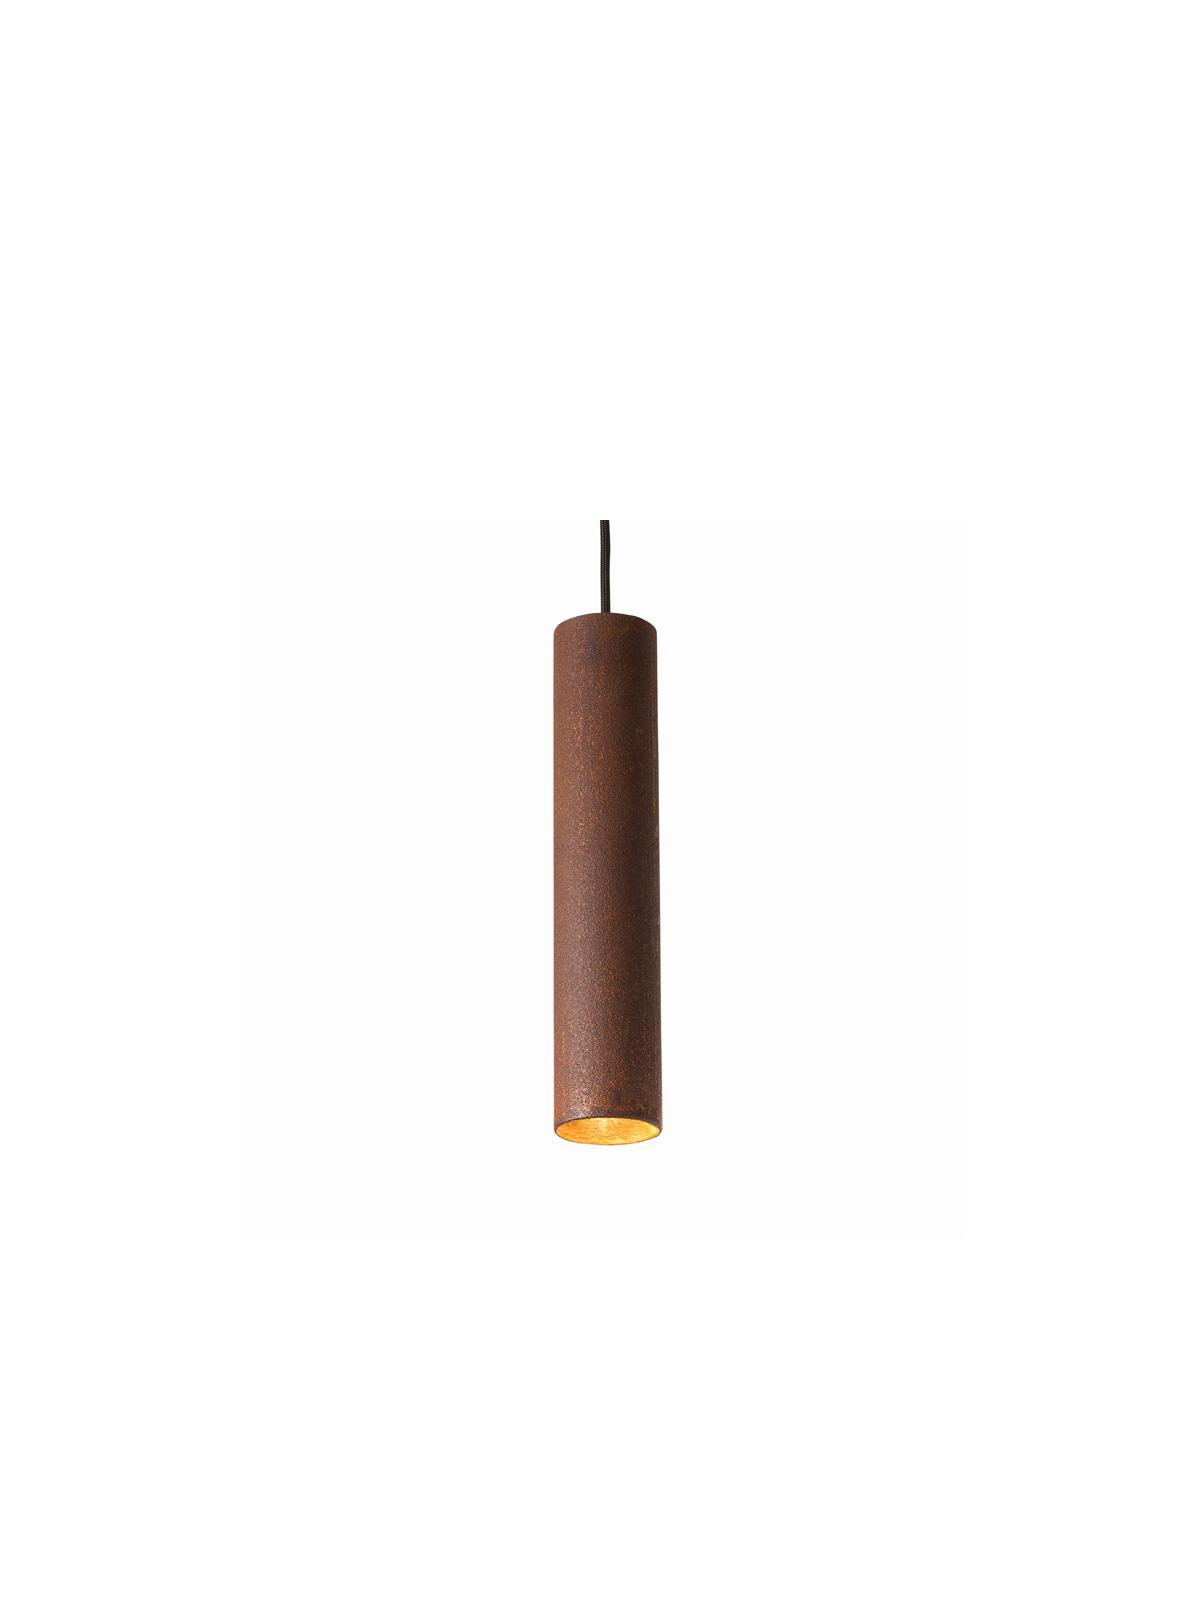 Graypants Roest DesignOrt Berlin Leuchten Onlineshop